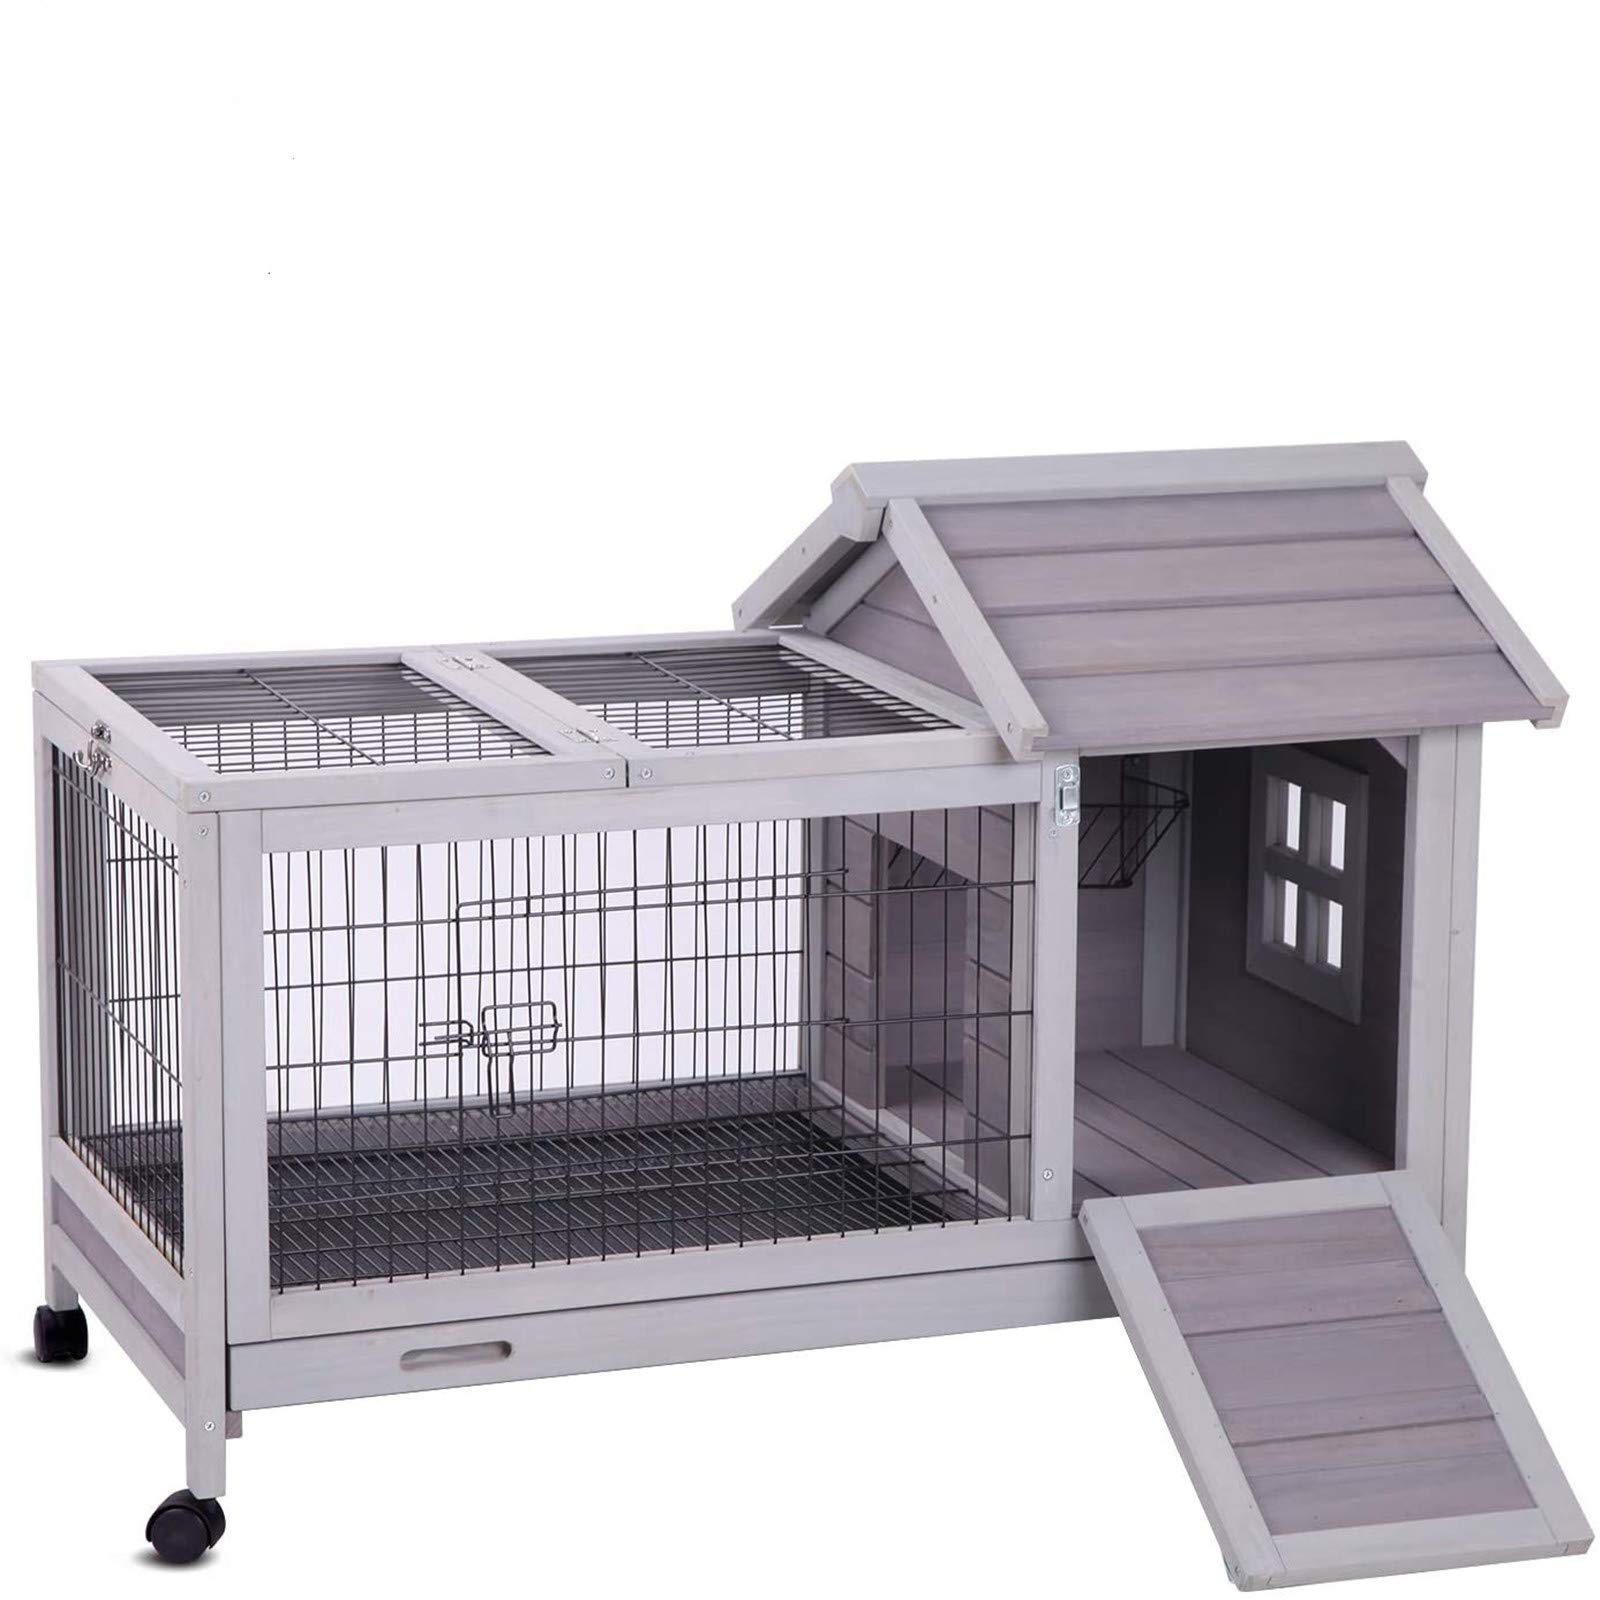 Aivituvin Rabbit Hutch Indoor Bunny Cage Outdoor with Deeper No ...